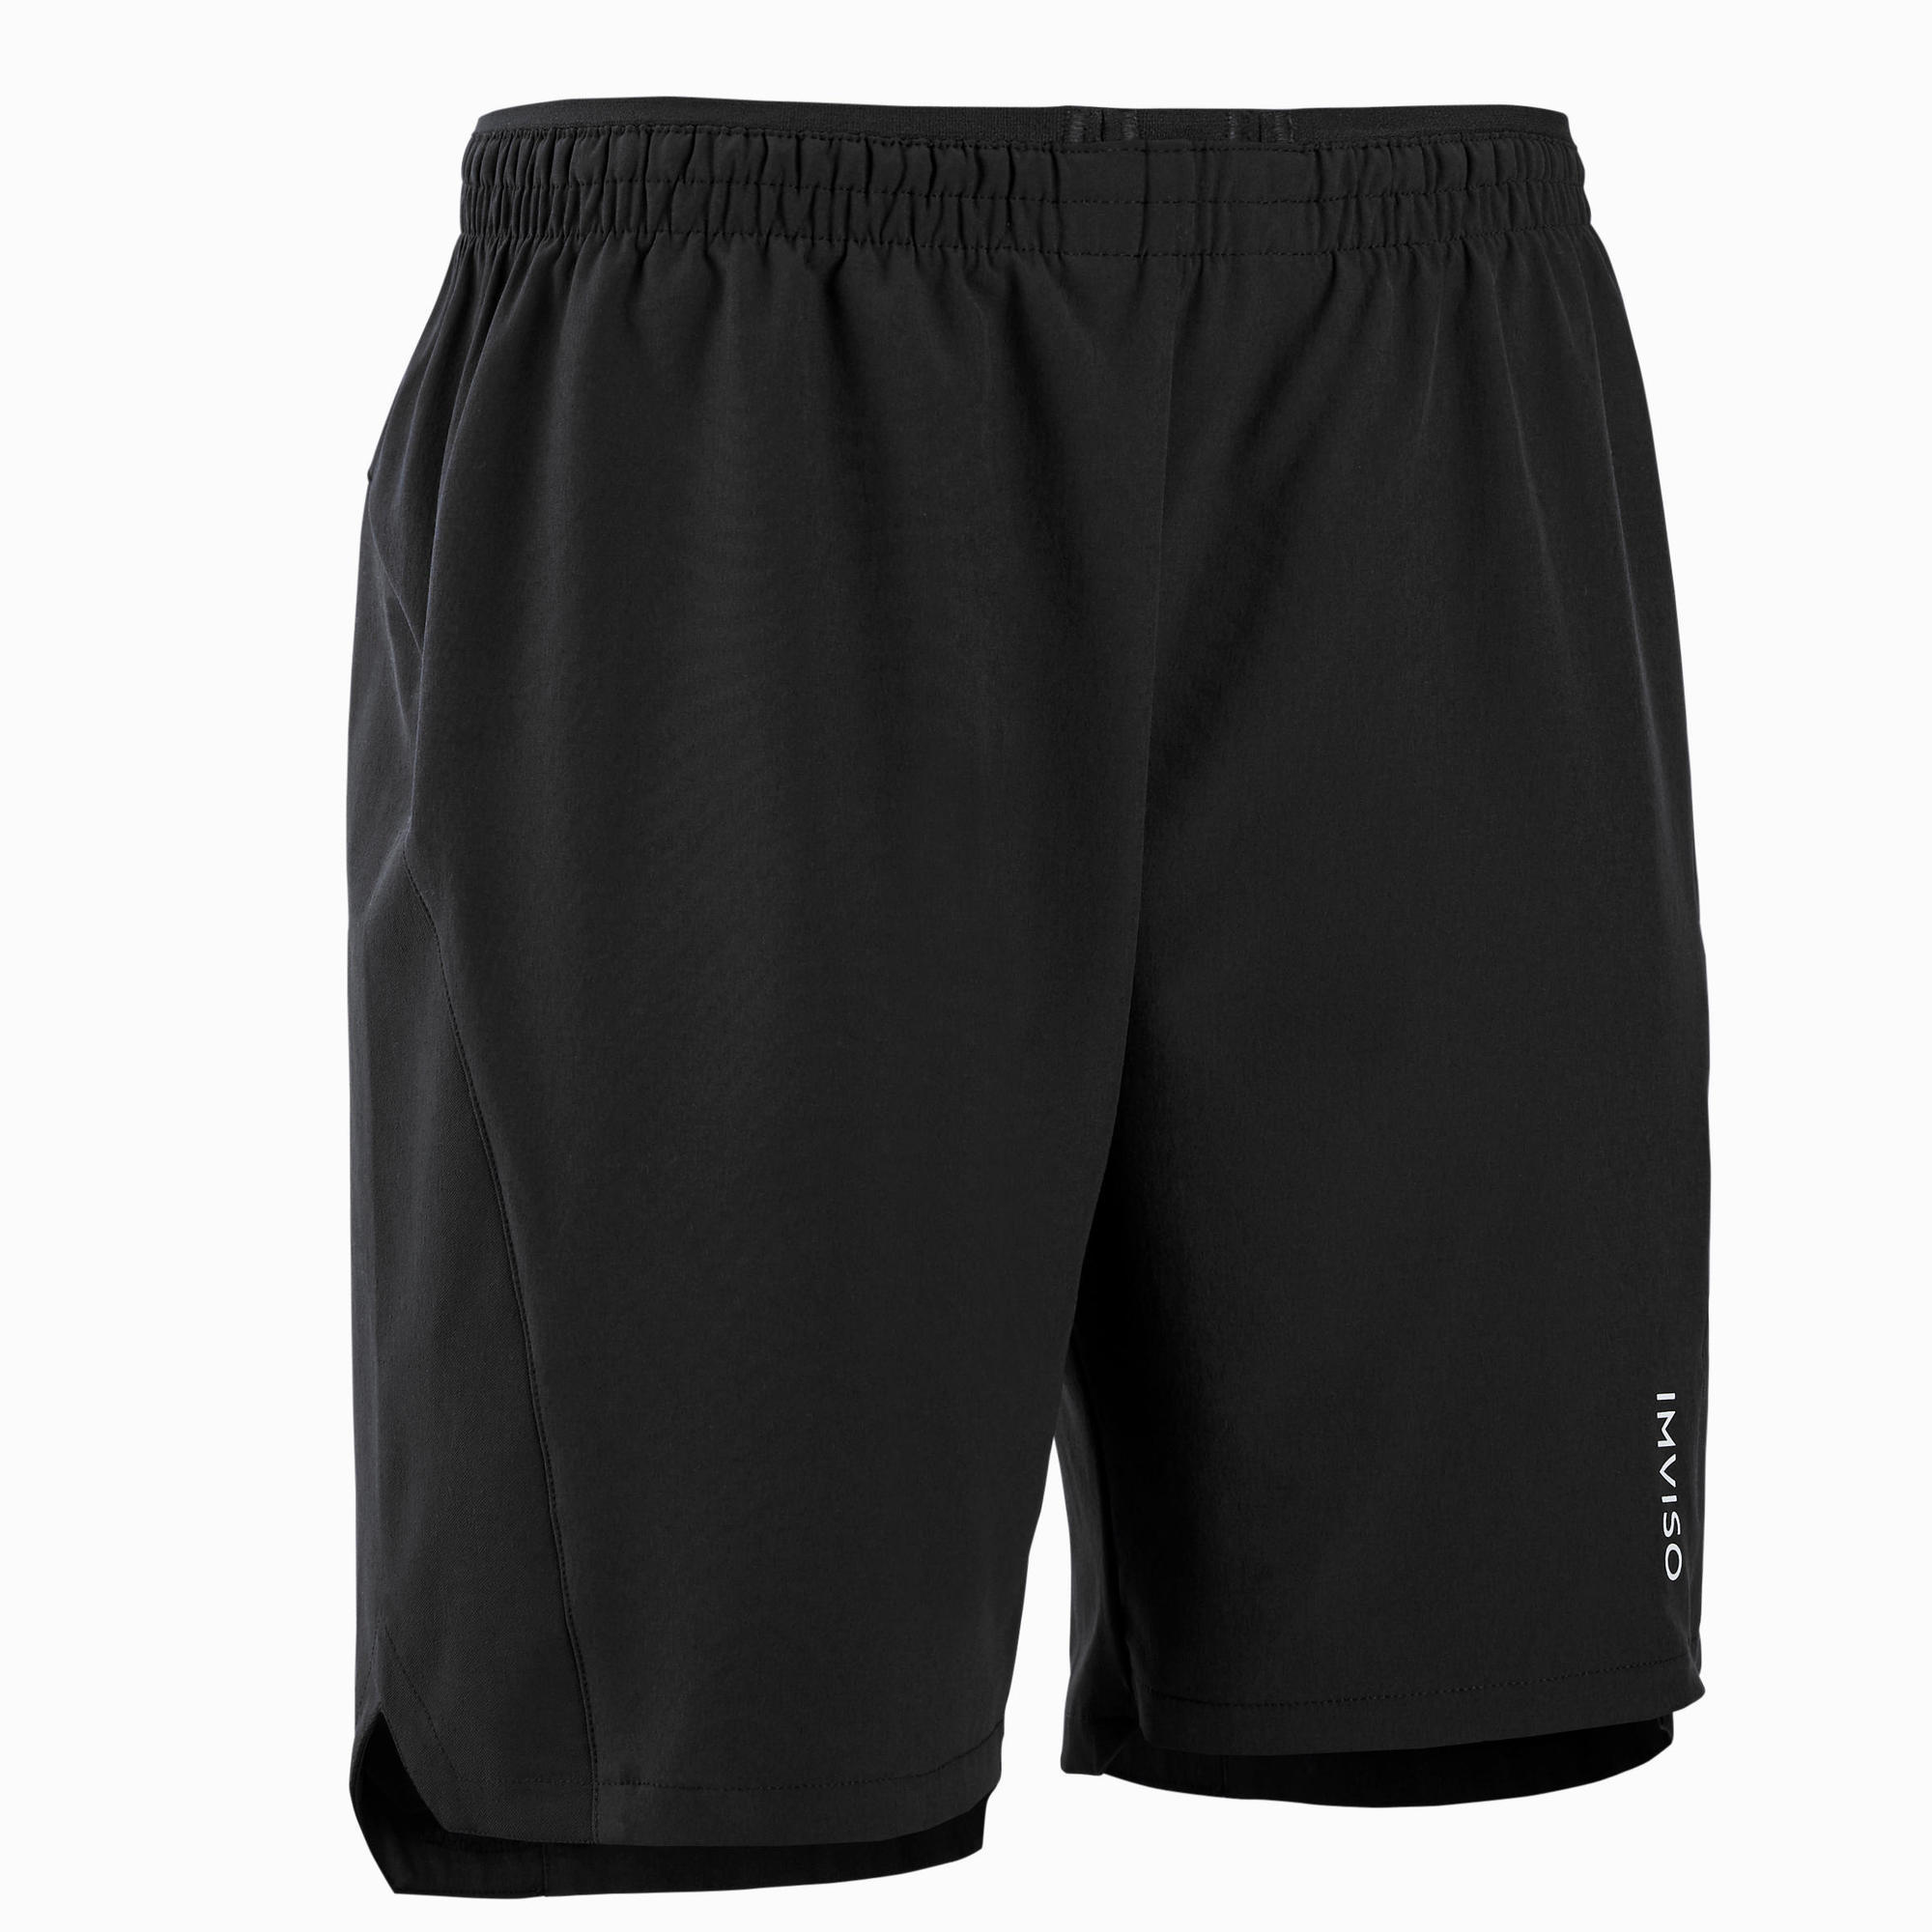 Fussballhose Futsal Herren   Sportbekleidung   Imviso